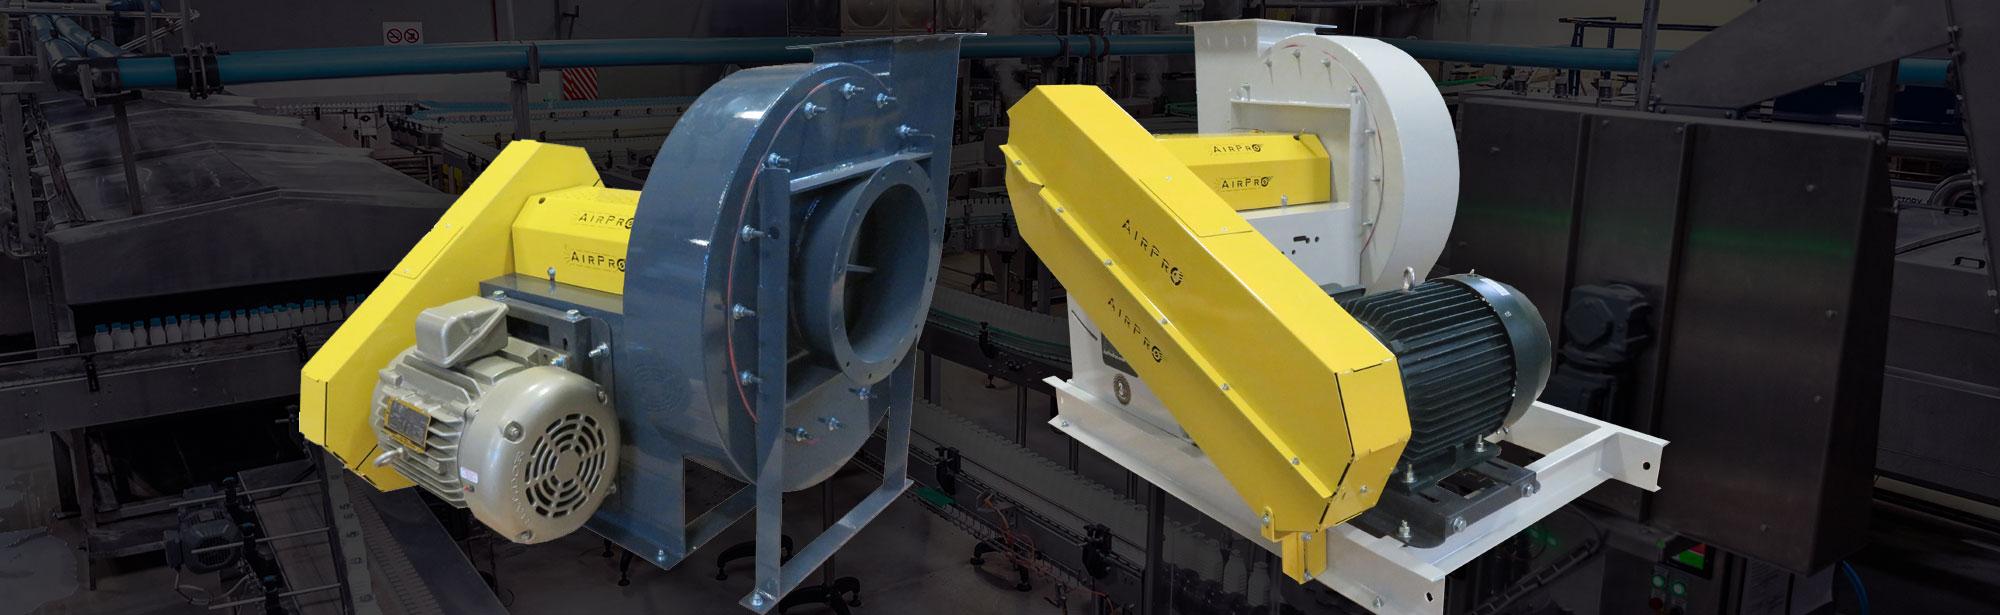 material handling centrifugal fans